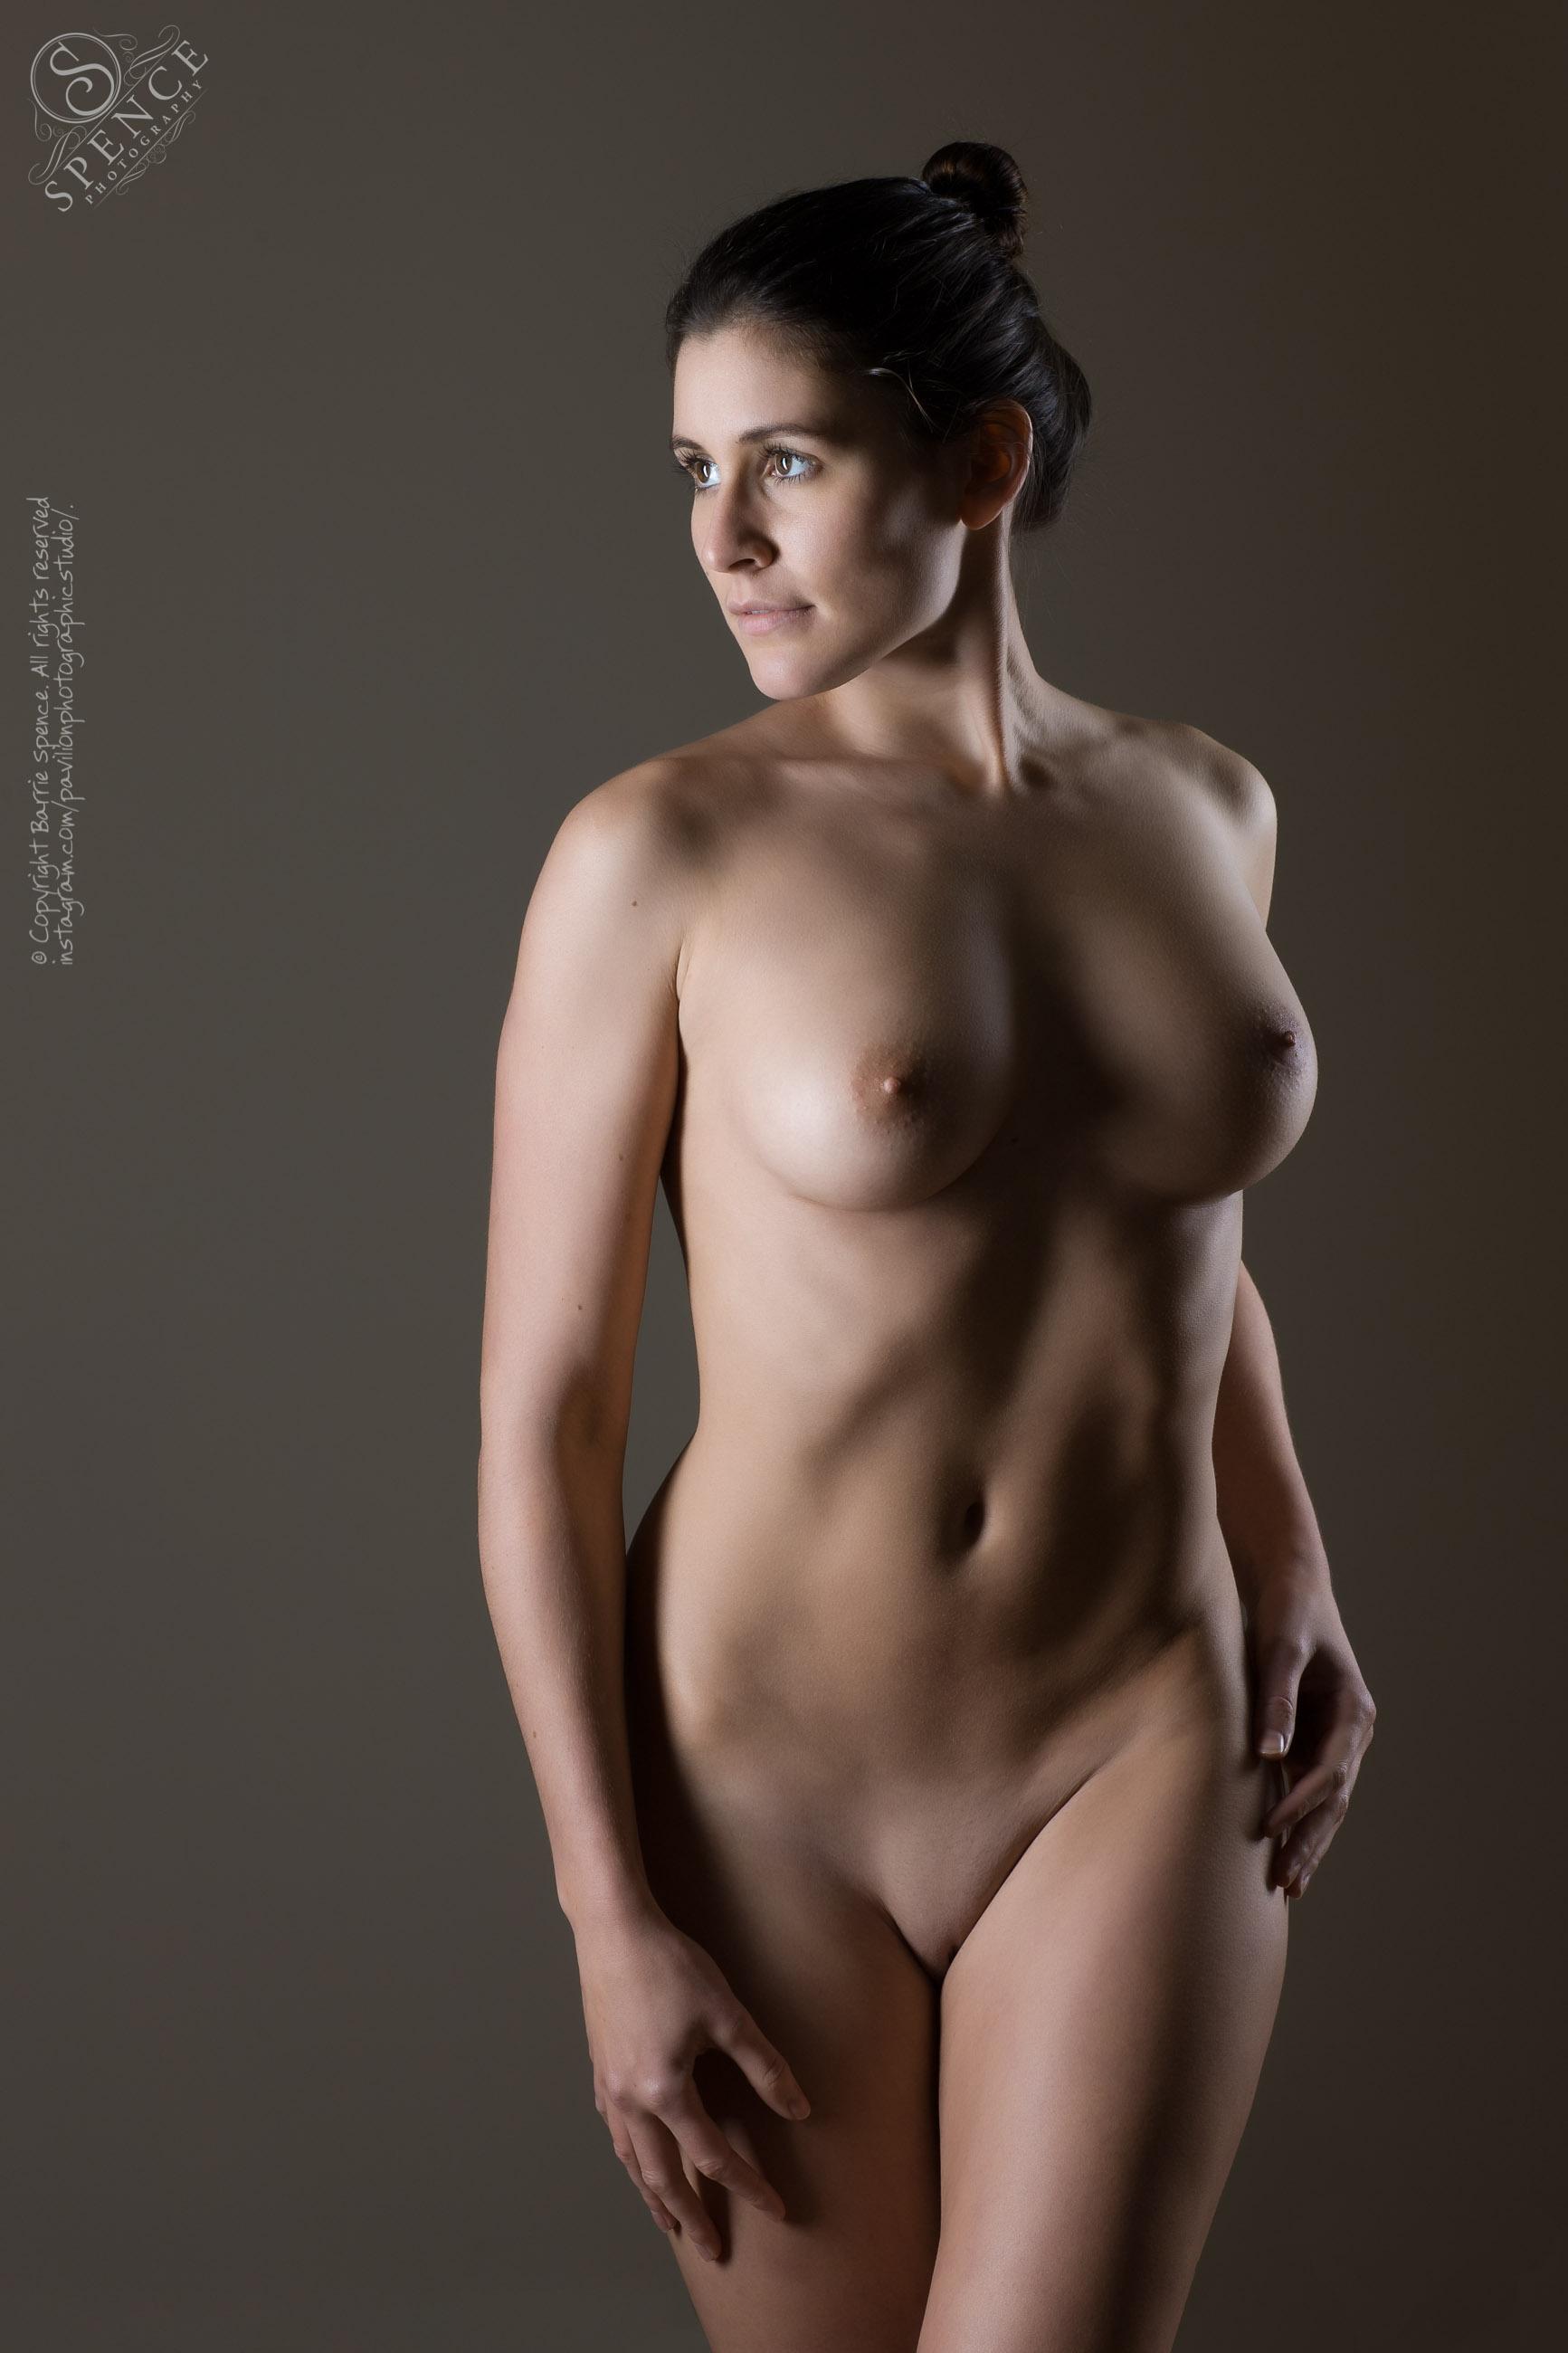 sexy girls in girls locker room nude